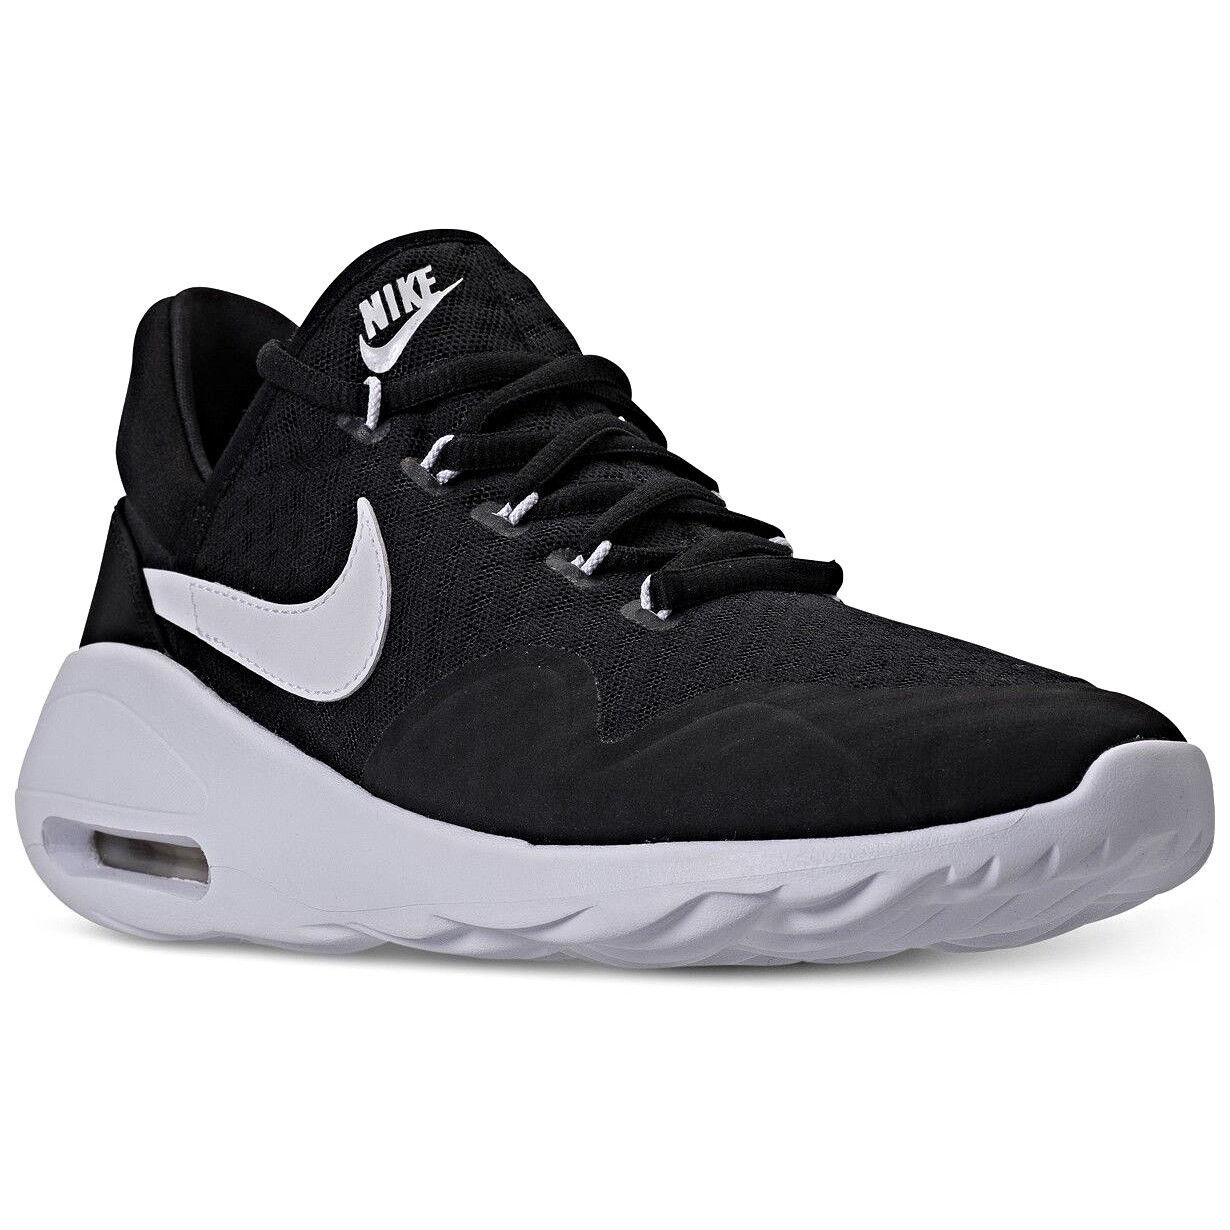 Nike Women Athletic Sneakers Running Running Running shoes Air Max Sasha Black 916783-003 b971d7